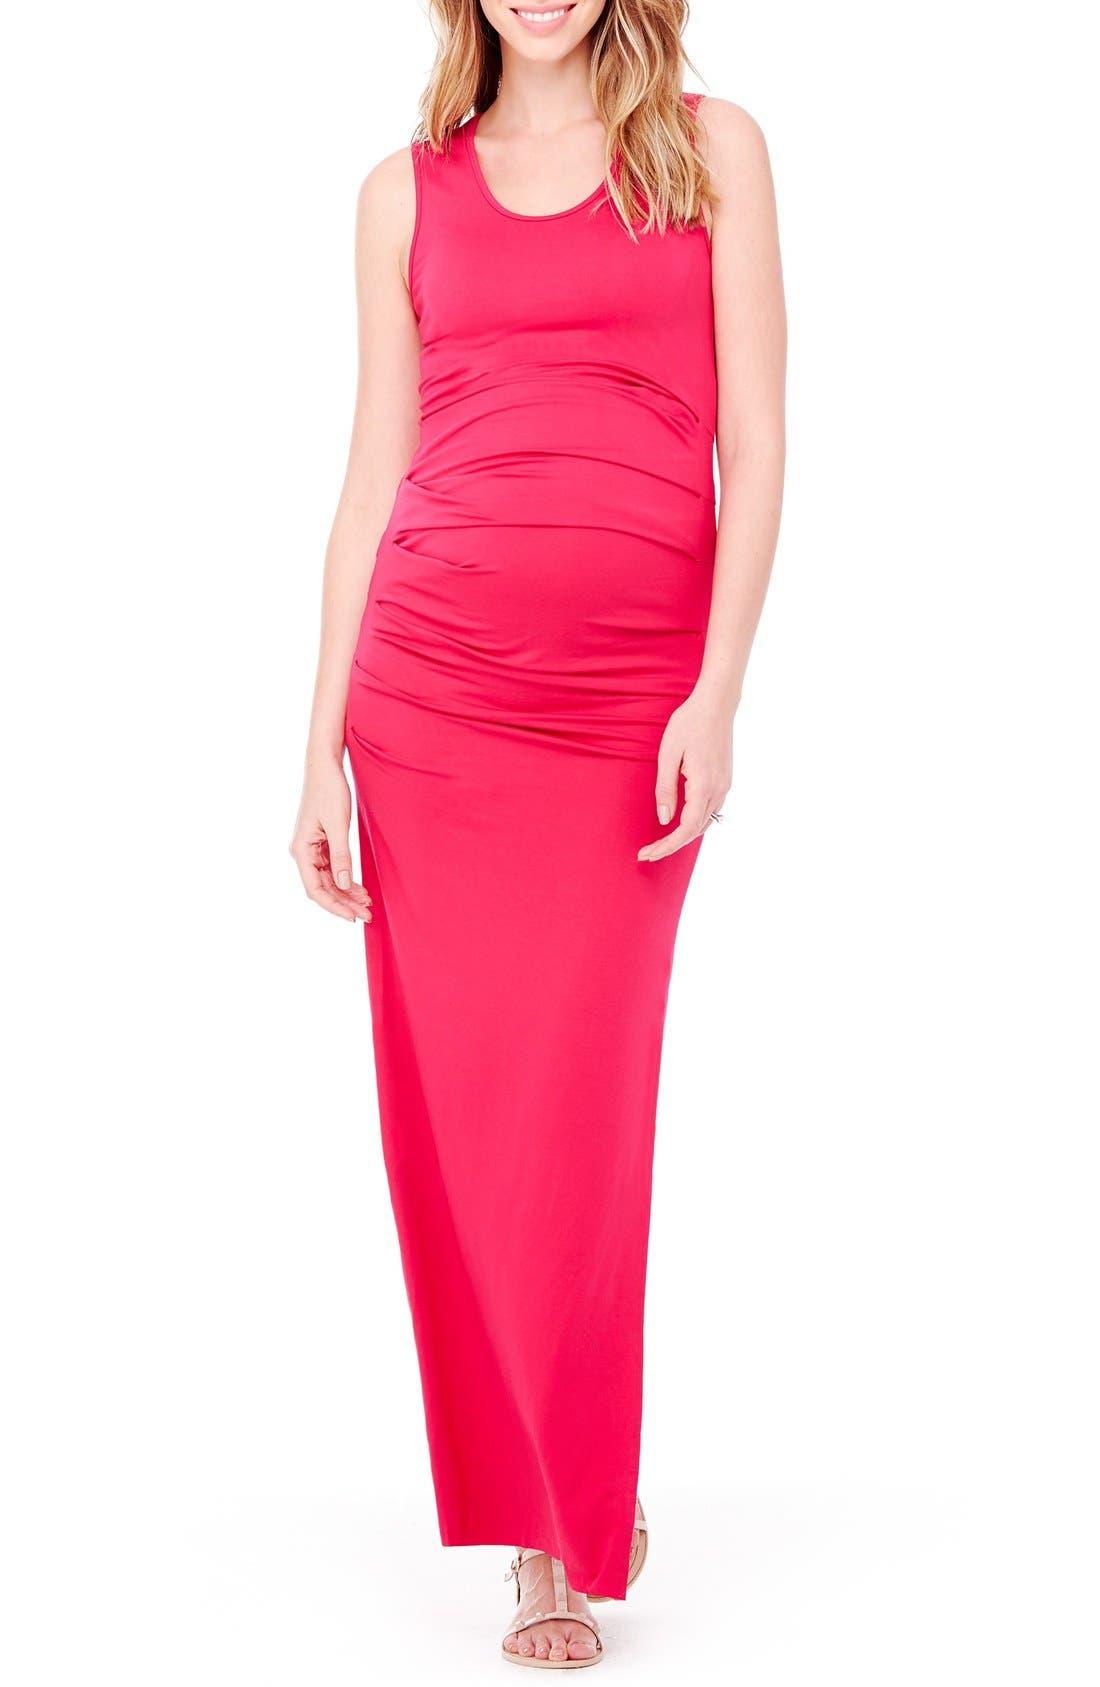 Alternate Image 1 Selected - Ingrid & Isabel® Striped Tank Maternity Maxi Dress